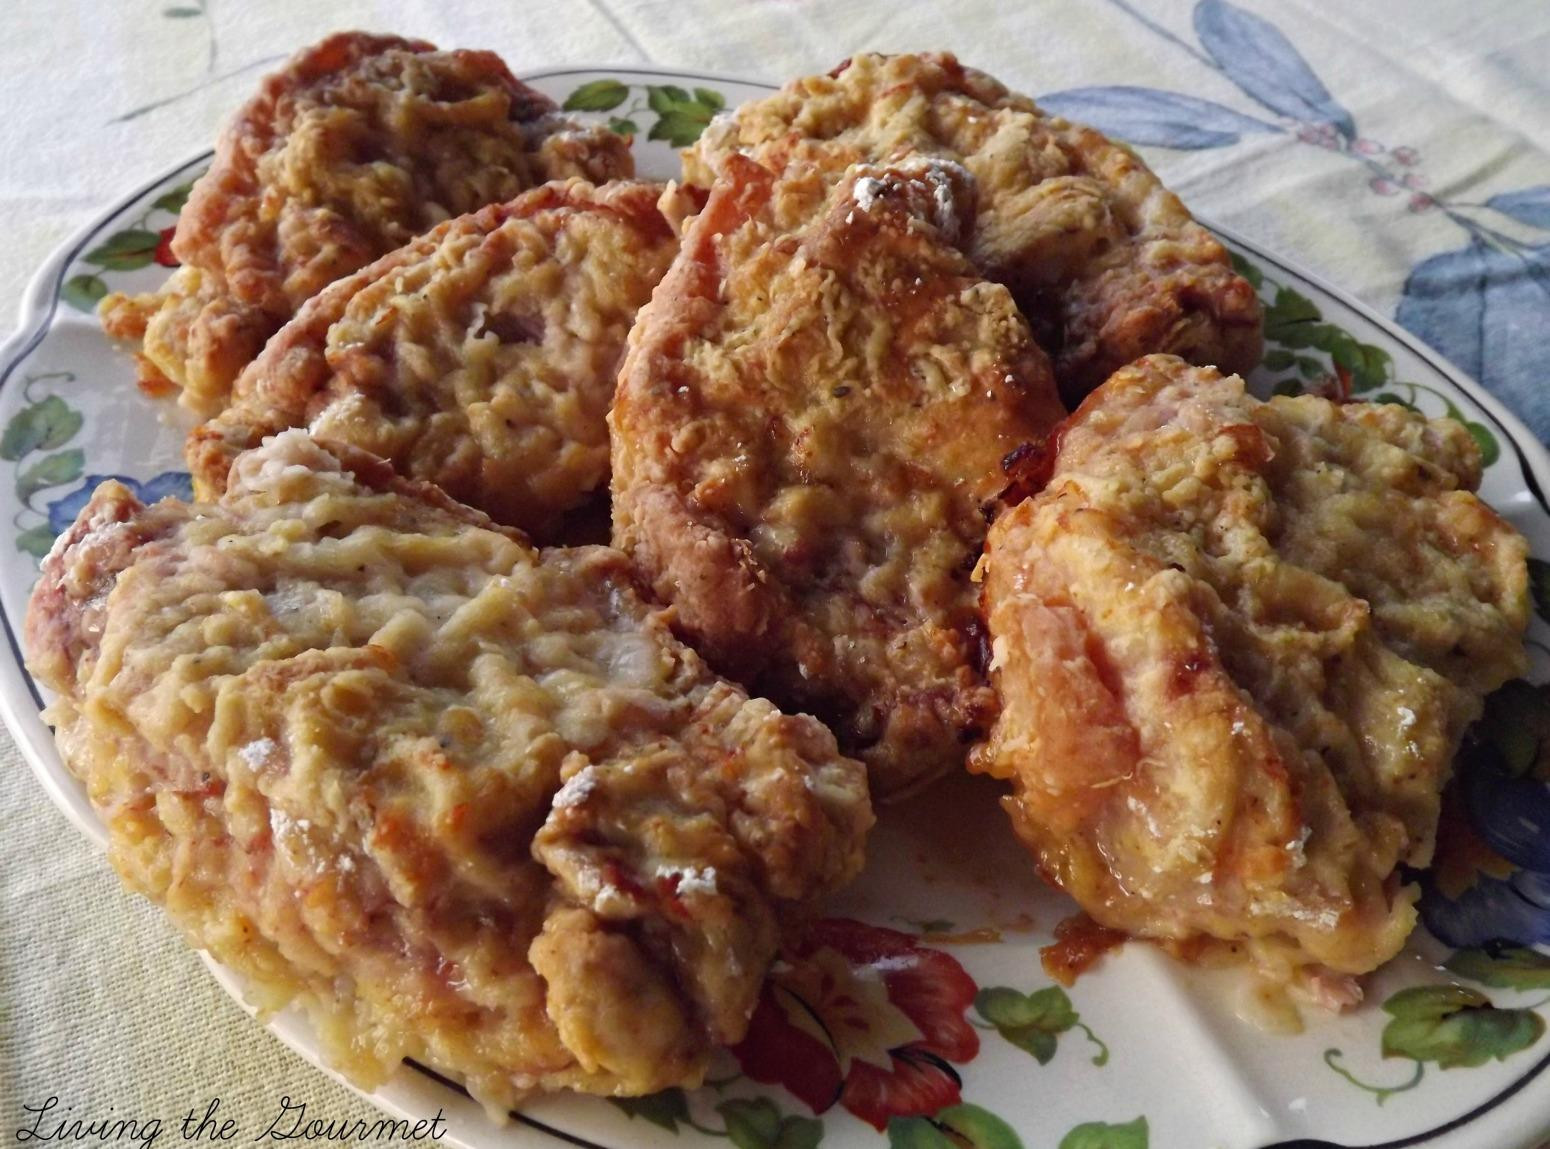 Fried Boneless Pork Chops Recipe  Oven Fried Boneless Pork Chops Recipe